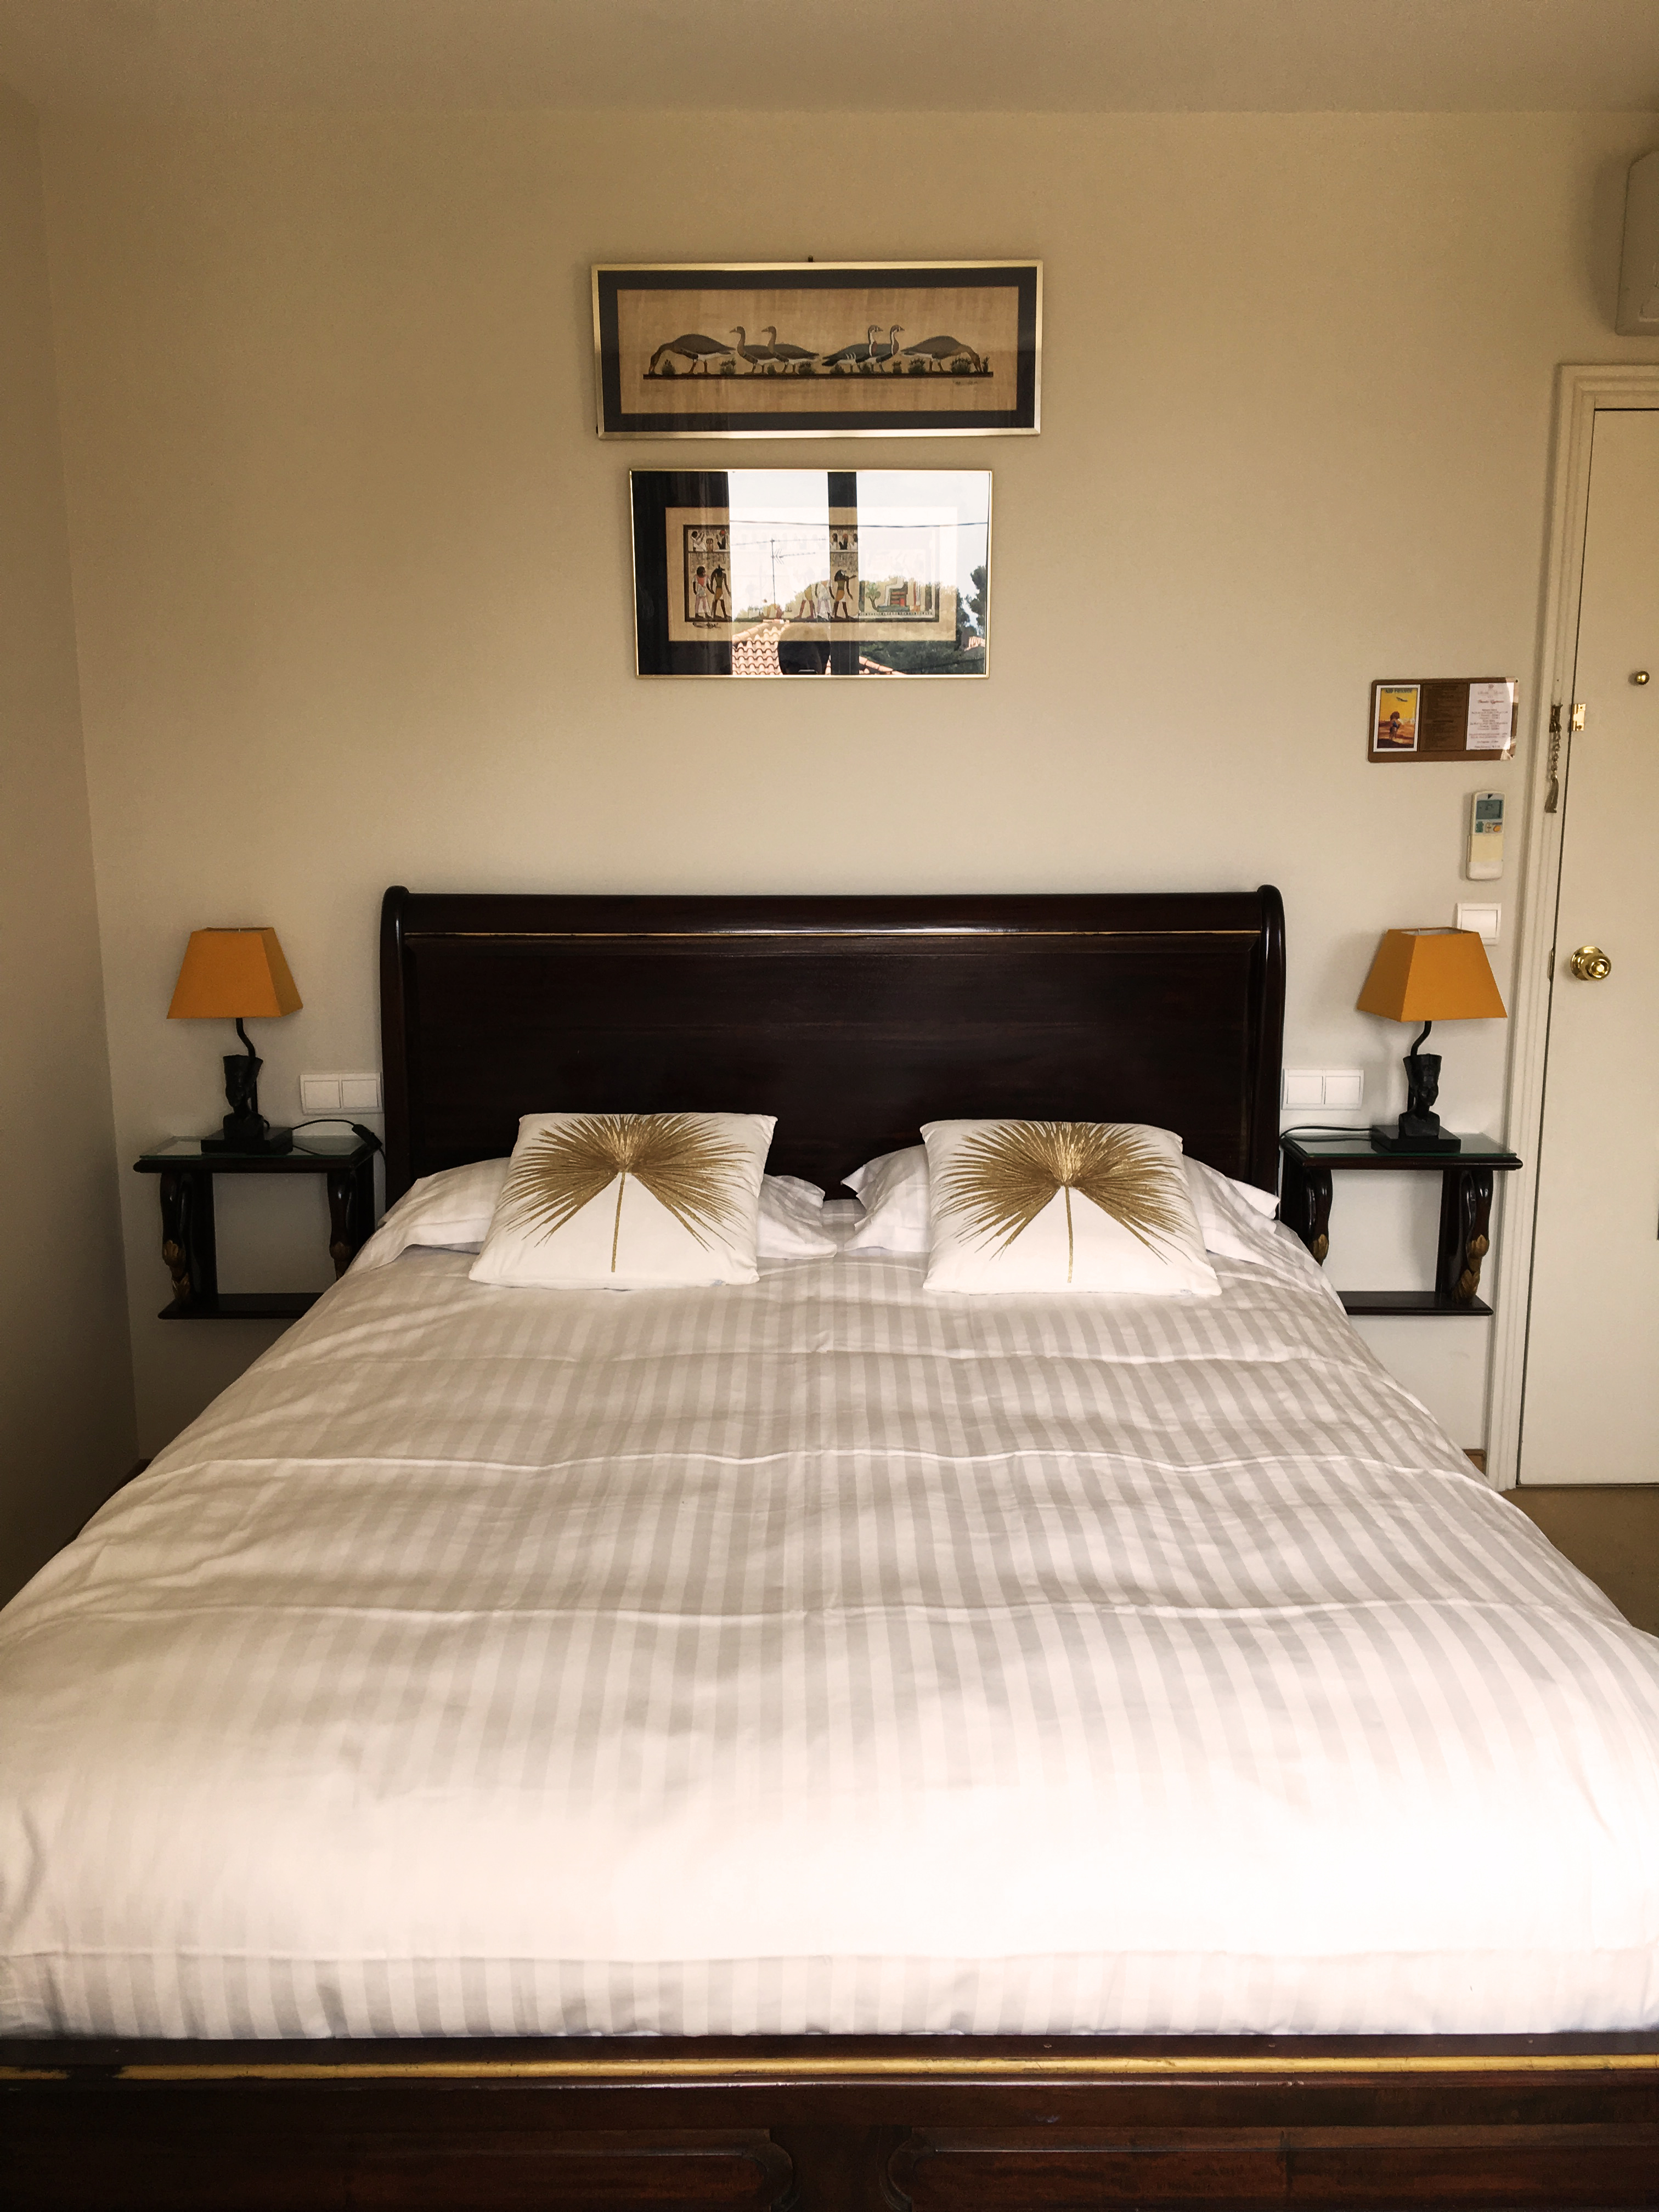 2 people Bedroom Santa Lucia Hotel